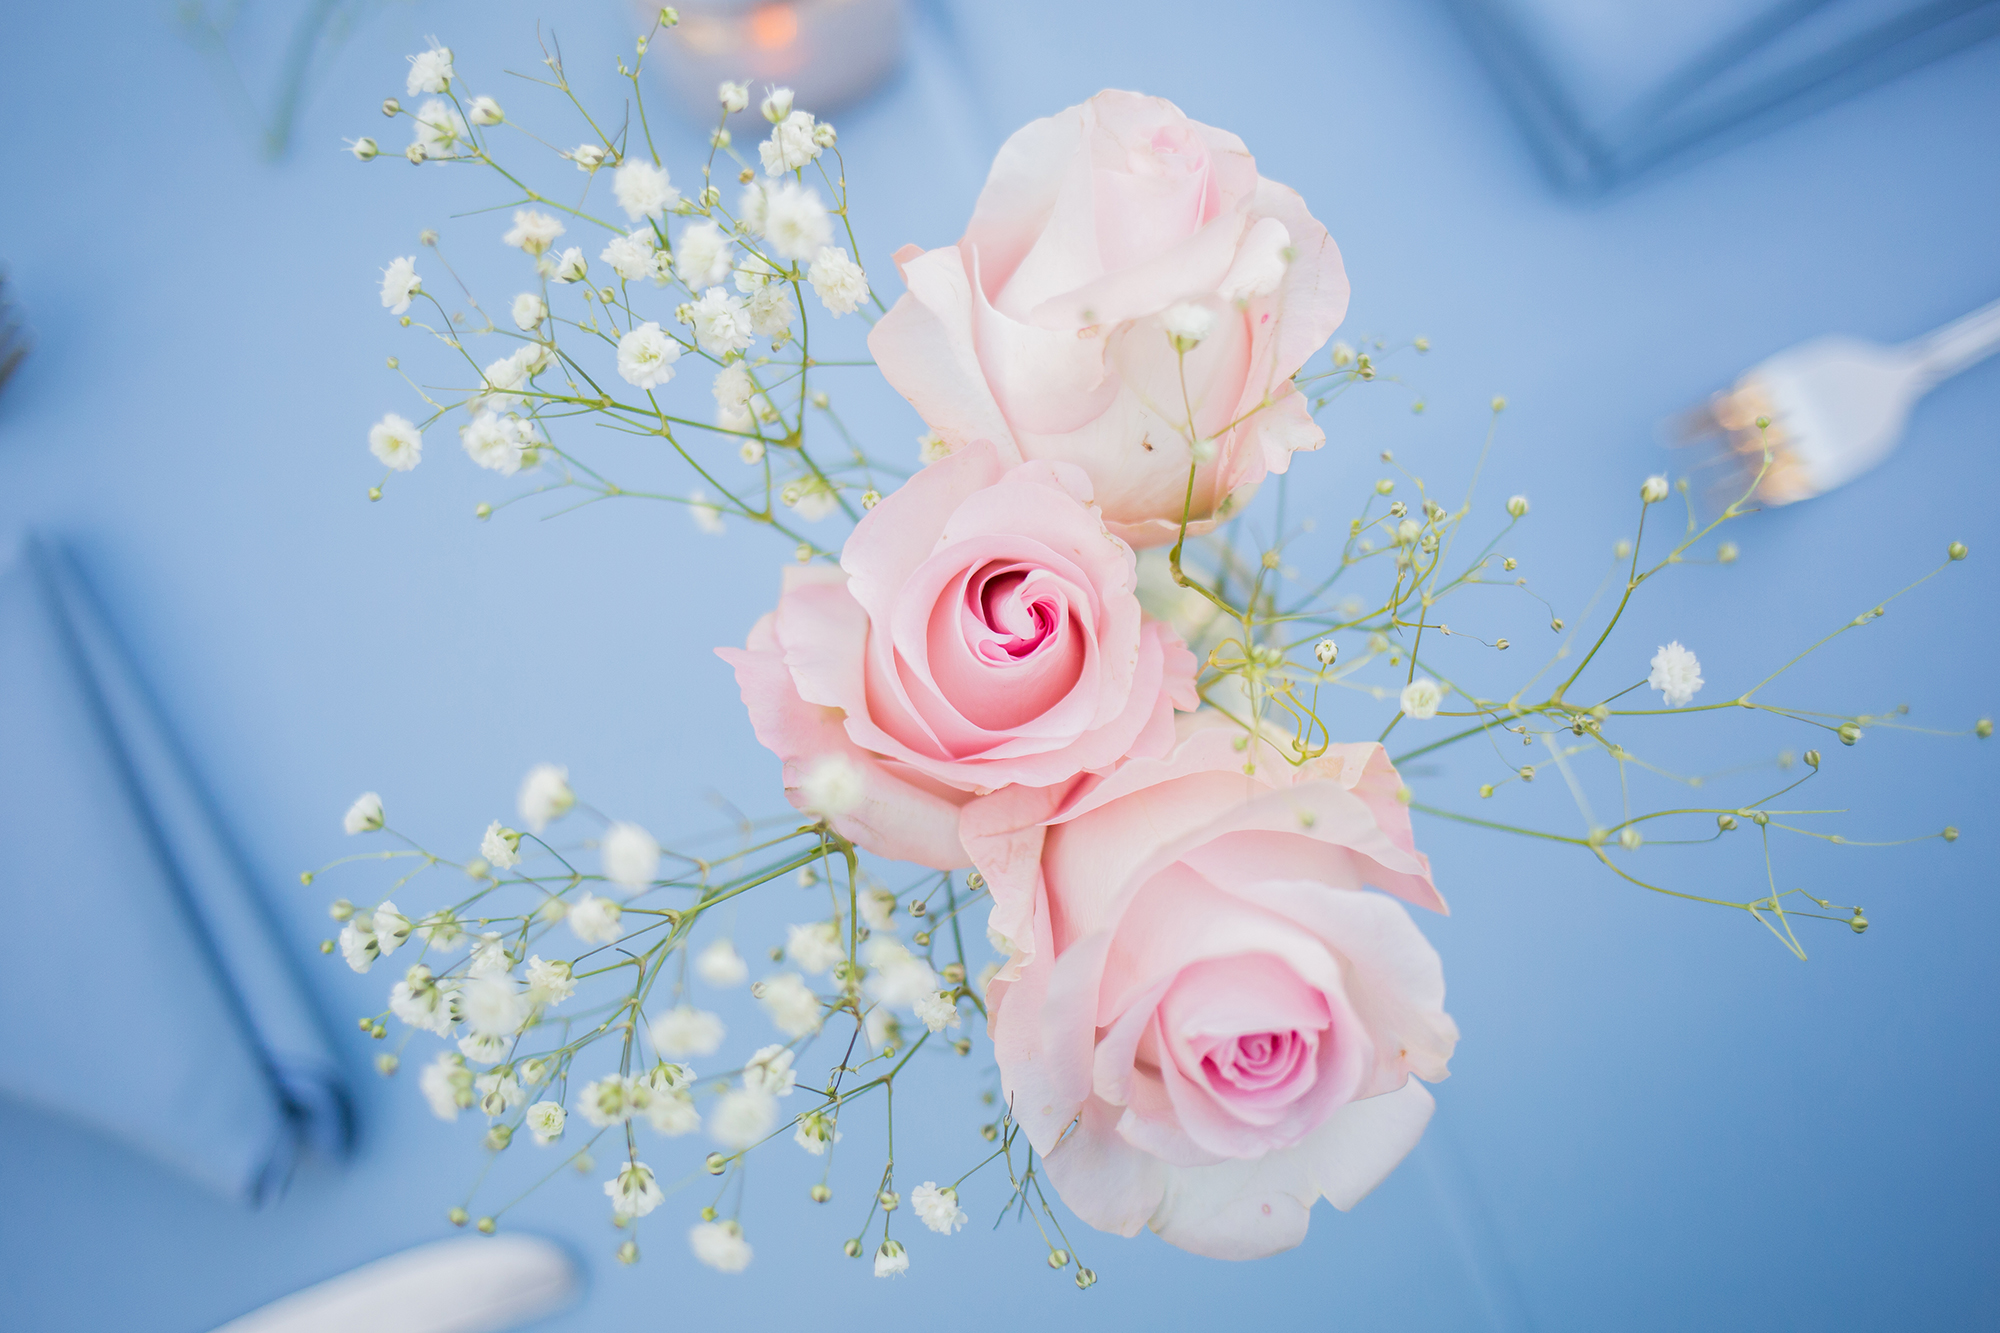 wilton-manors-wedding.jpg